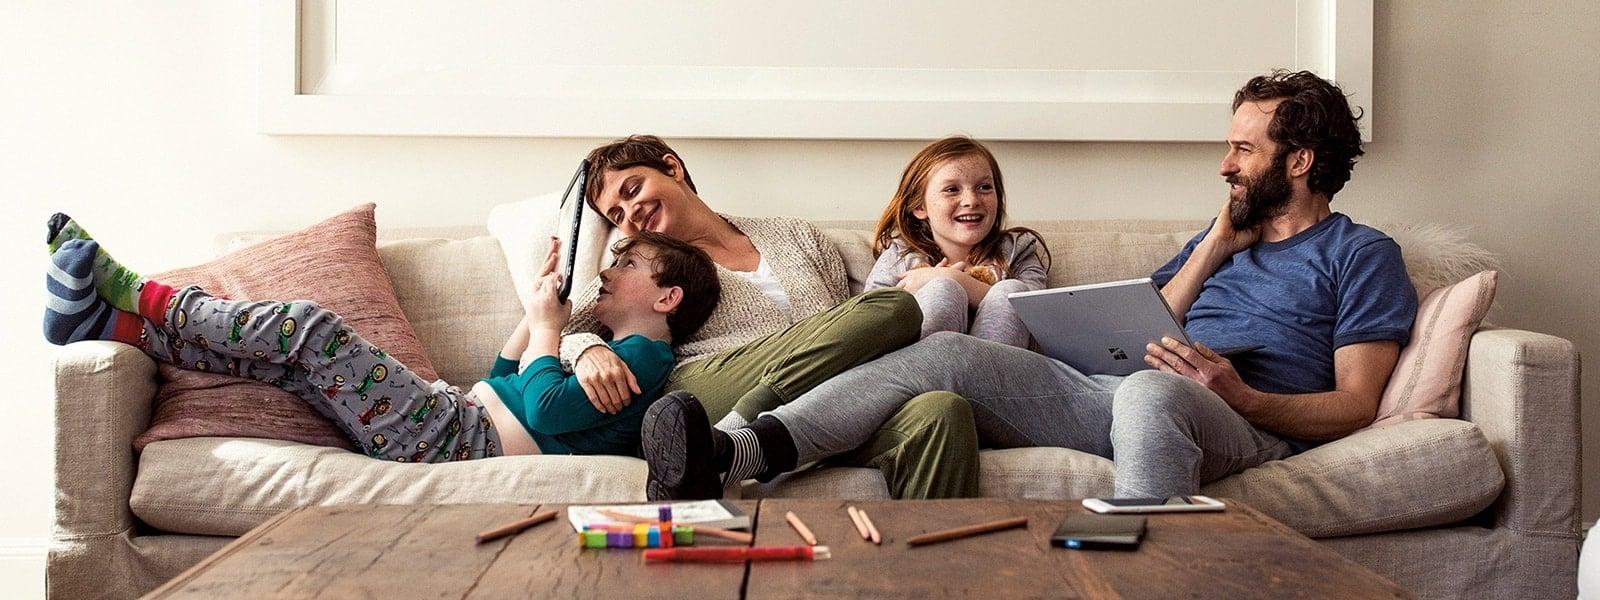 Family lying on a sofa